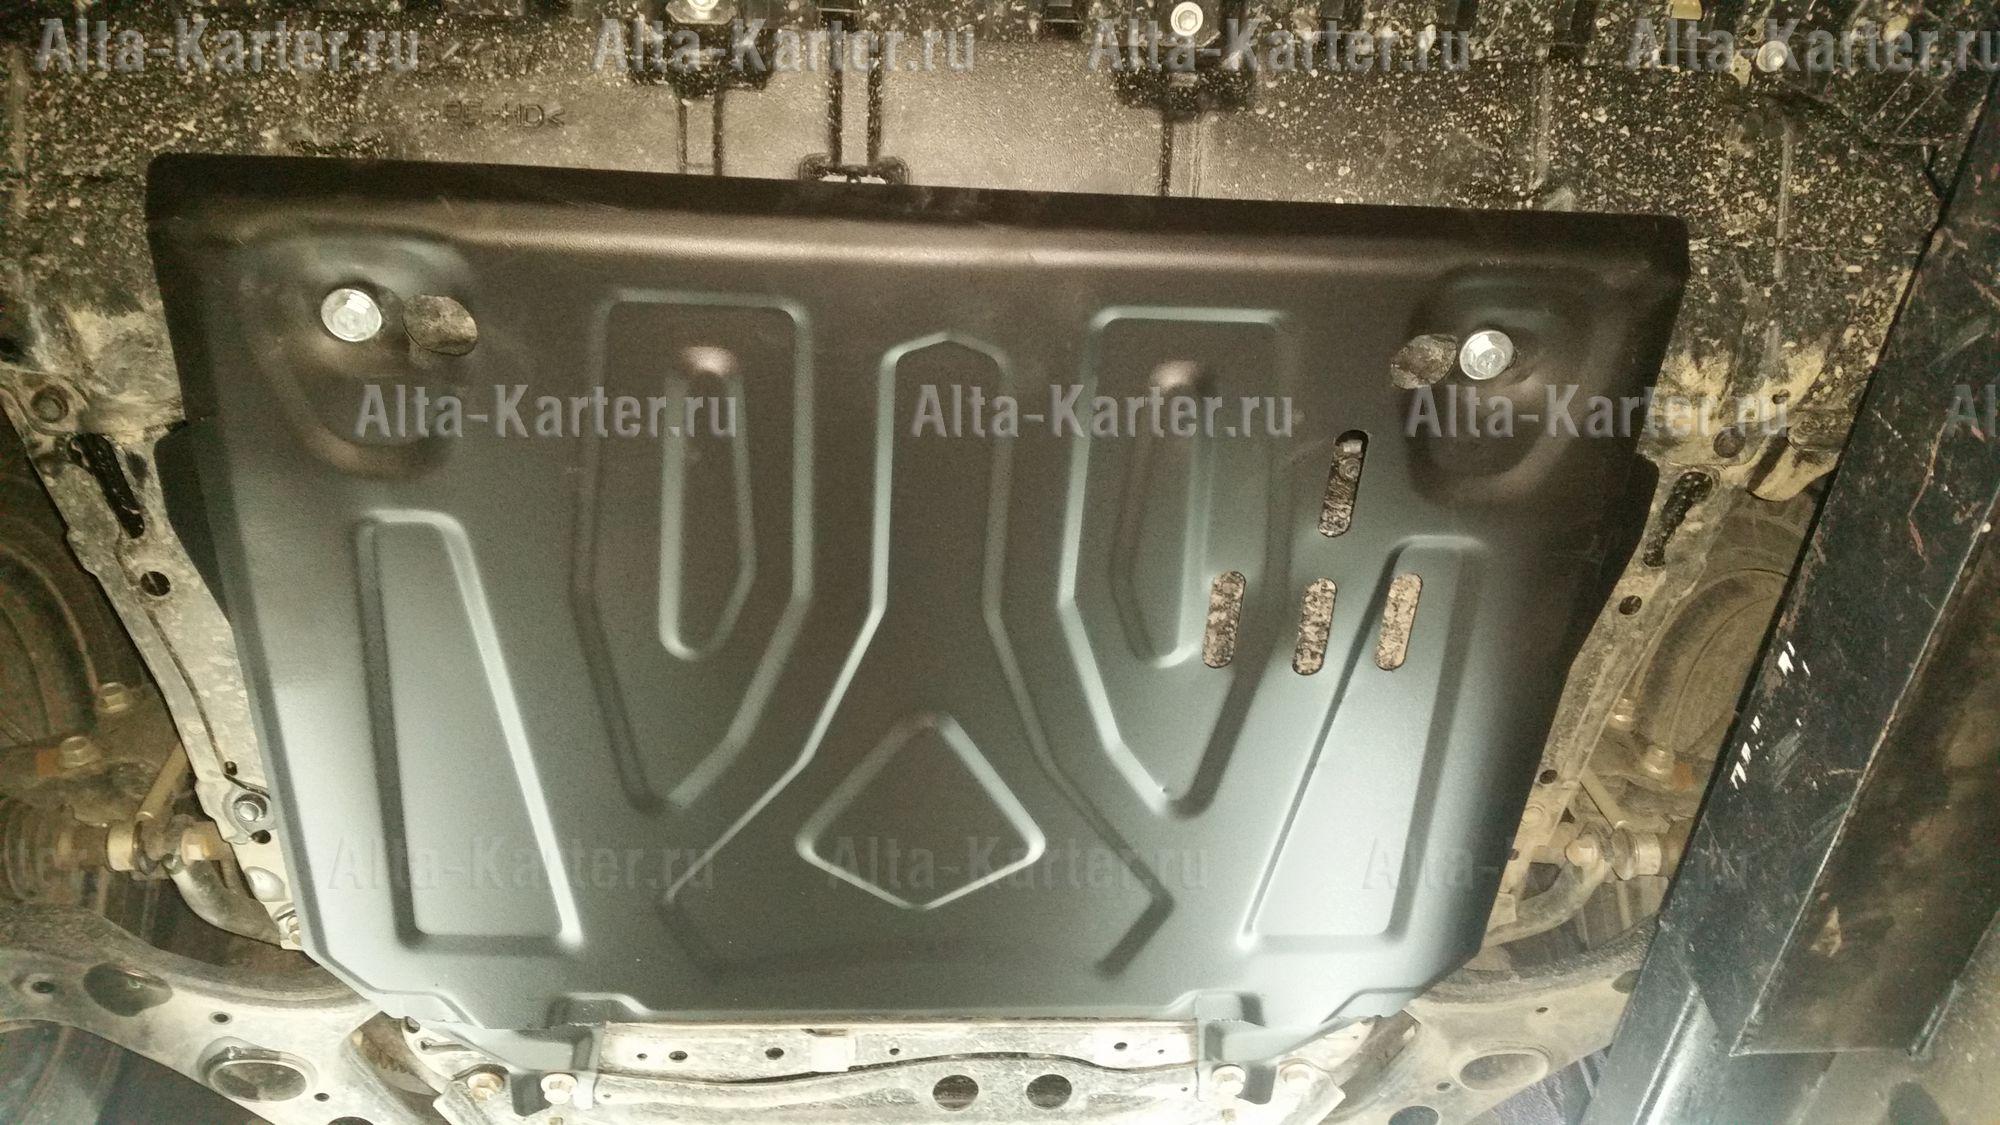 Защита Alfeco для картера и КПП Toyota RAV4 IV 2013-2019. Артикул ALF.24.660st